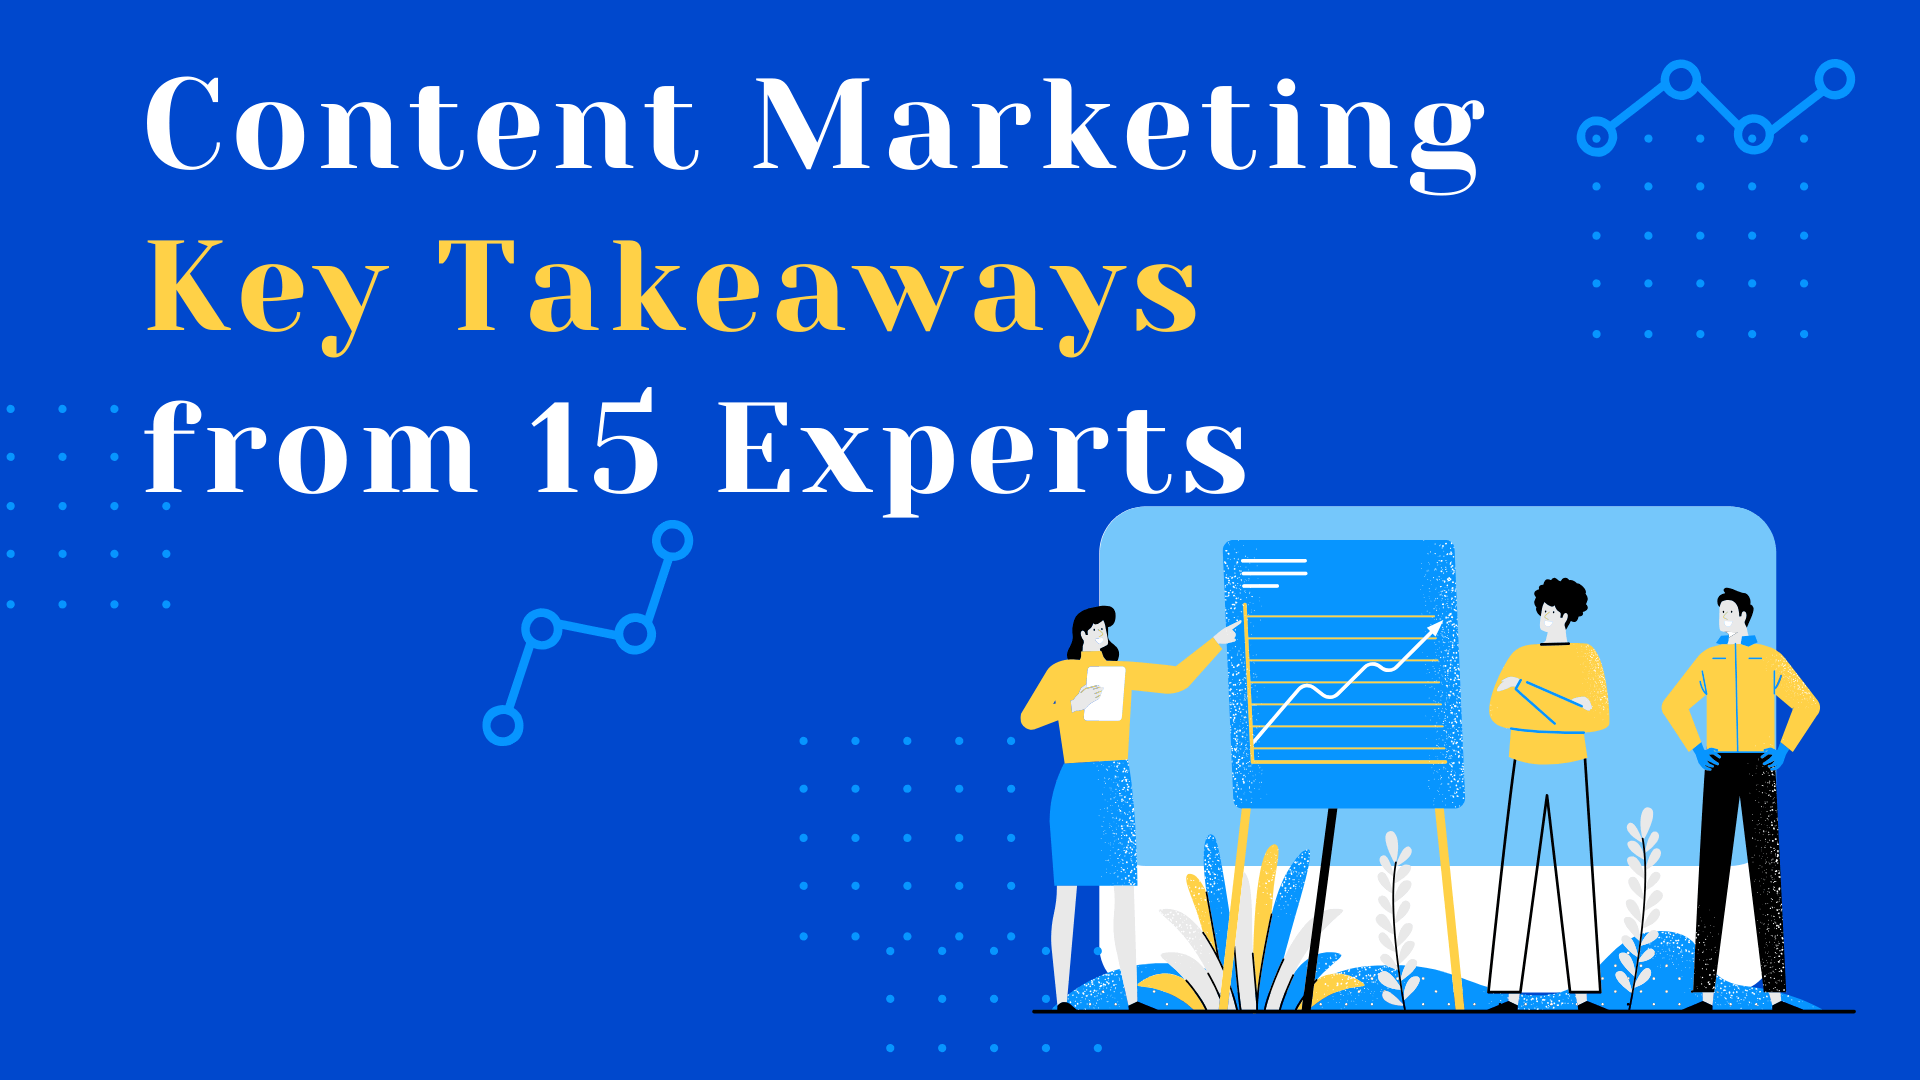 Content Marketing Takeaways - An Expert Roundup